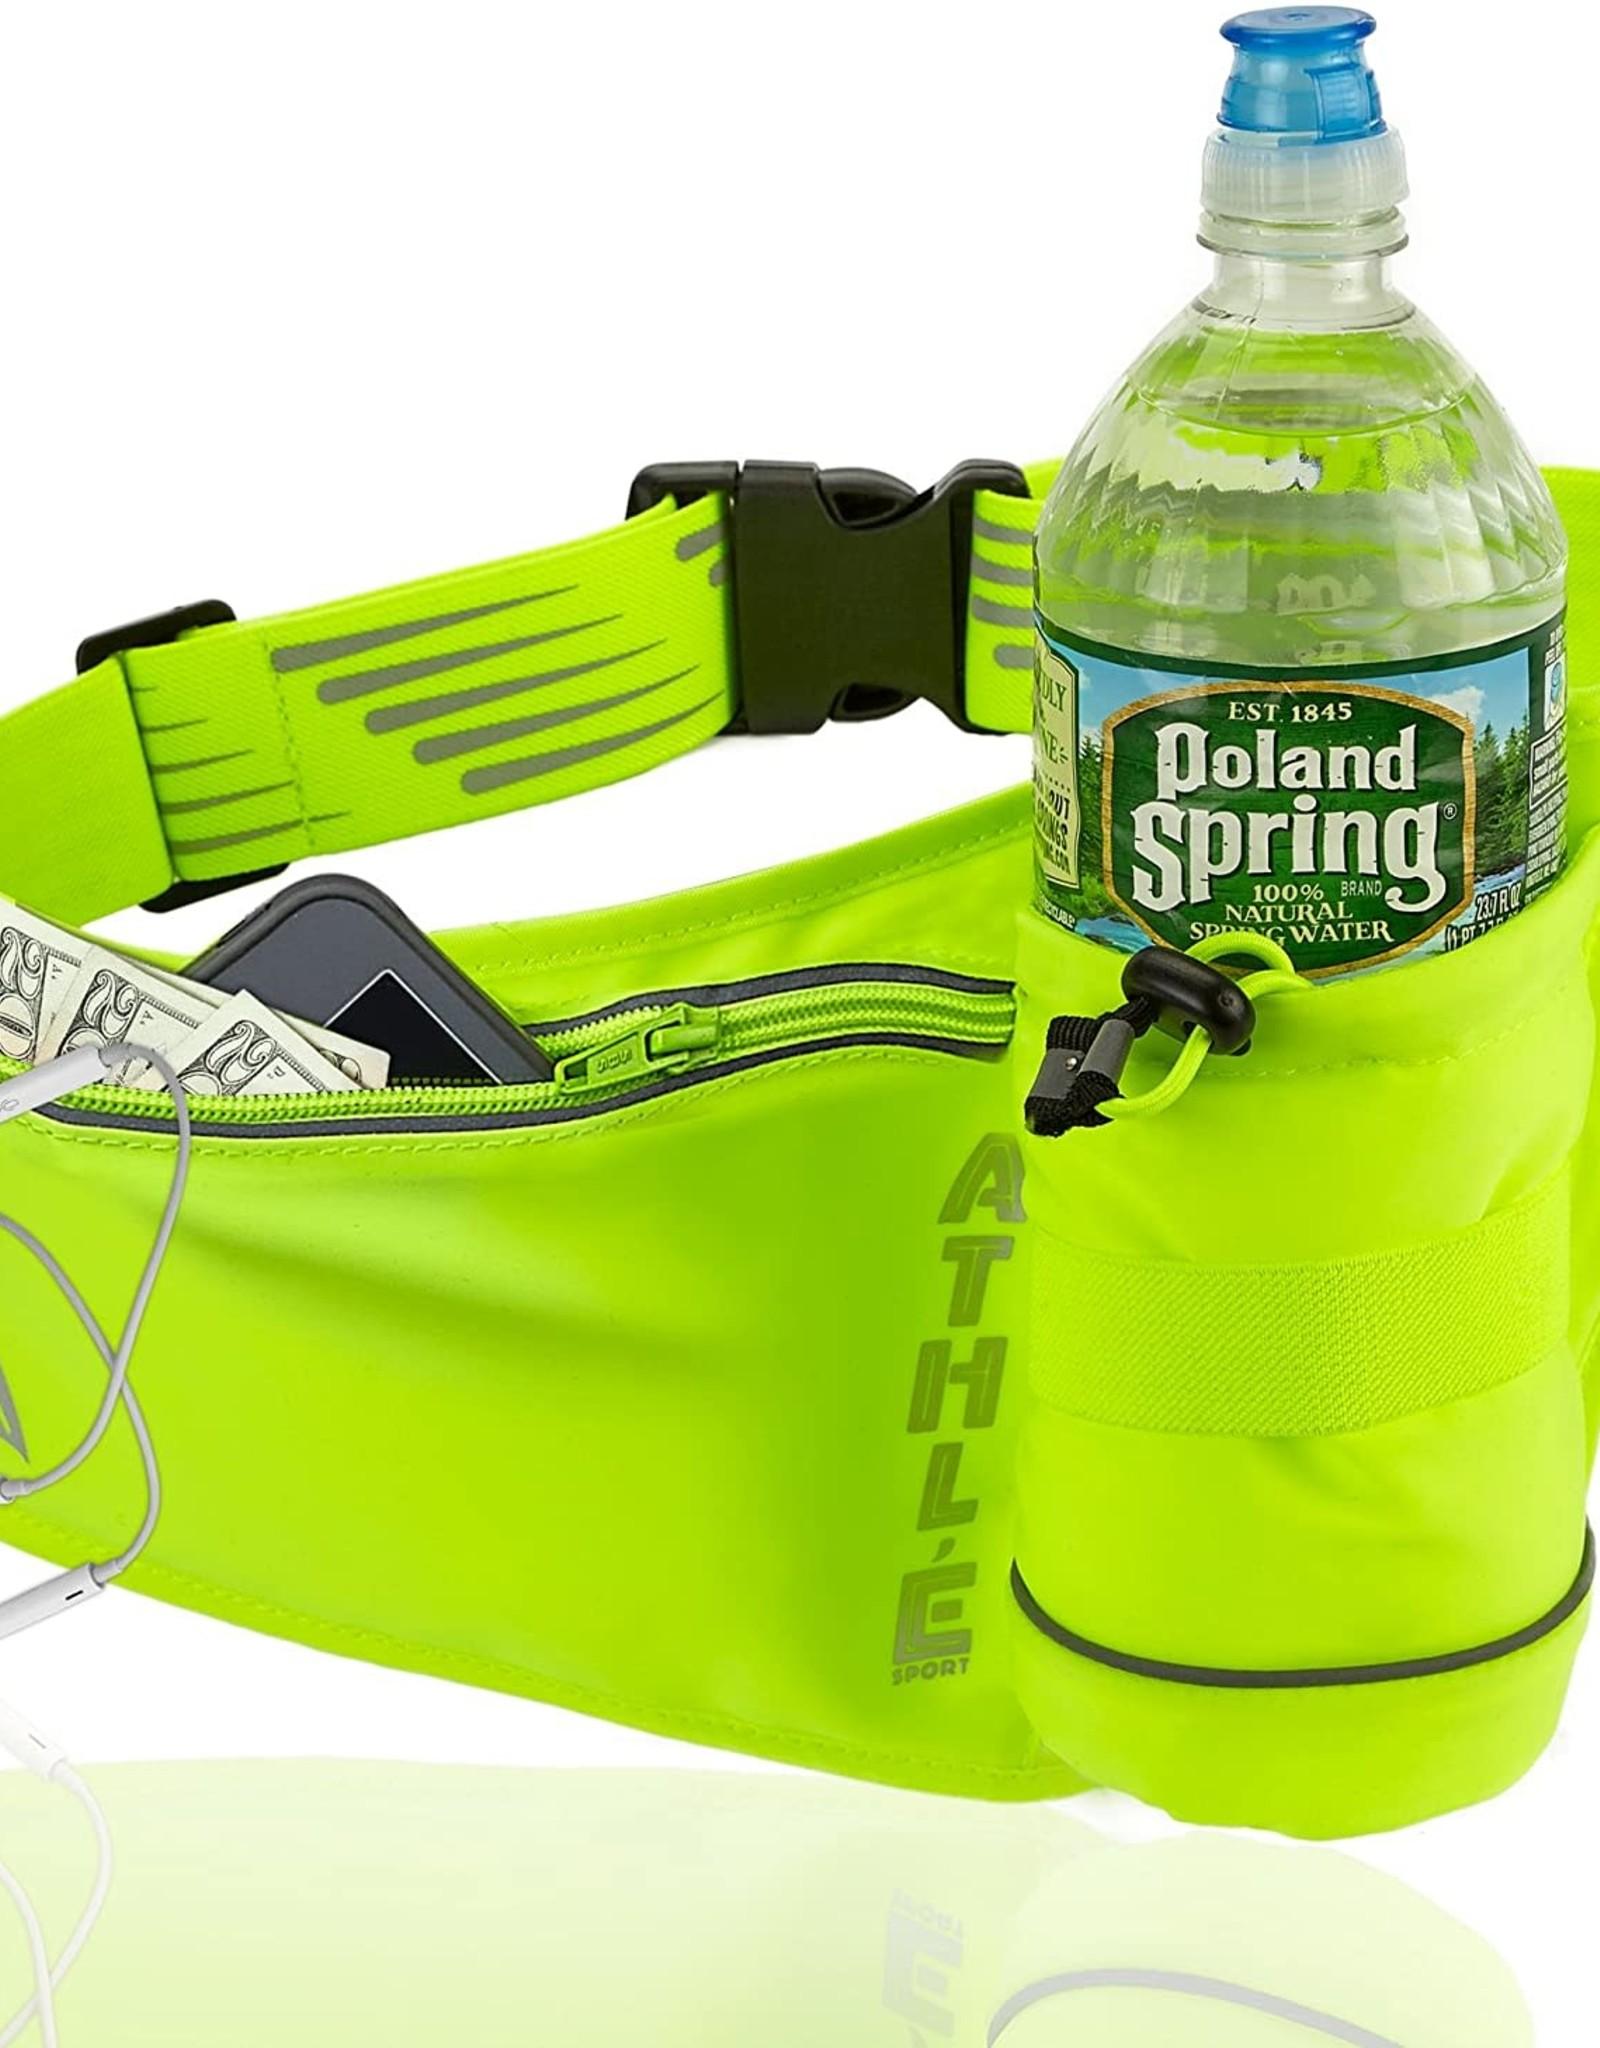 pictet-fino Pictet - Fino  (RH23) Outdoor Sports Belt Waist Pack with Water Bottle Holder